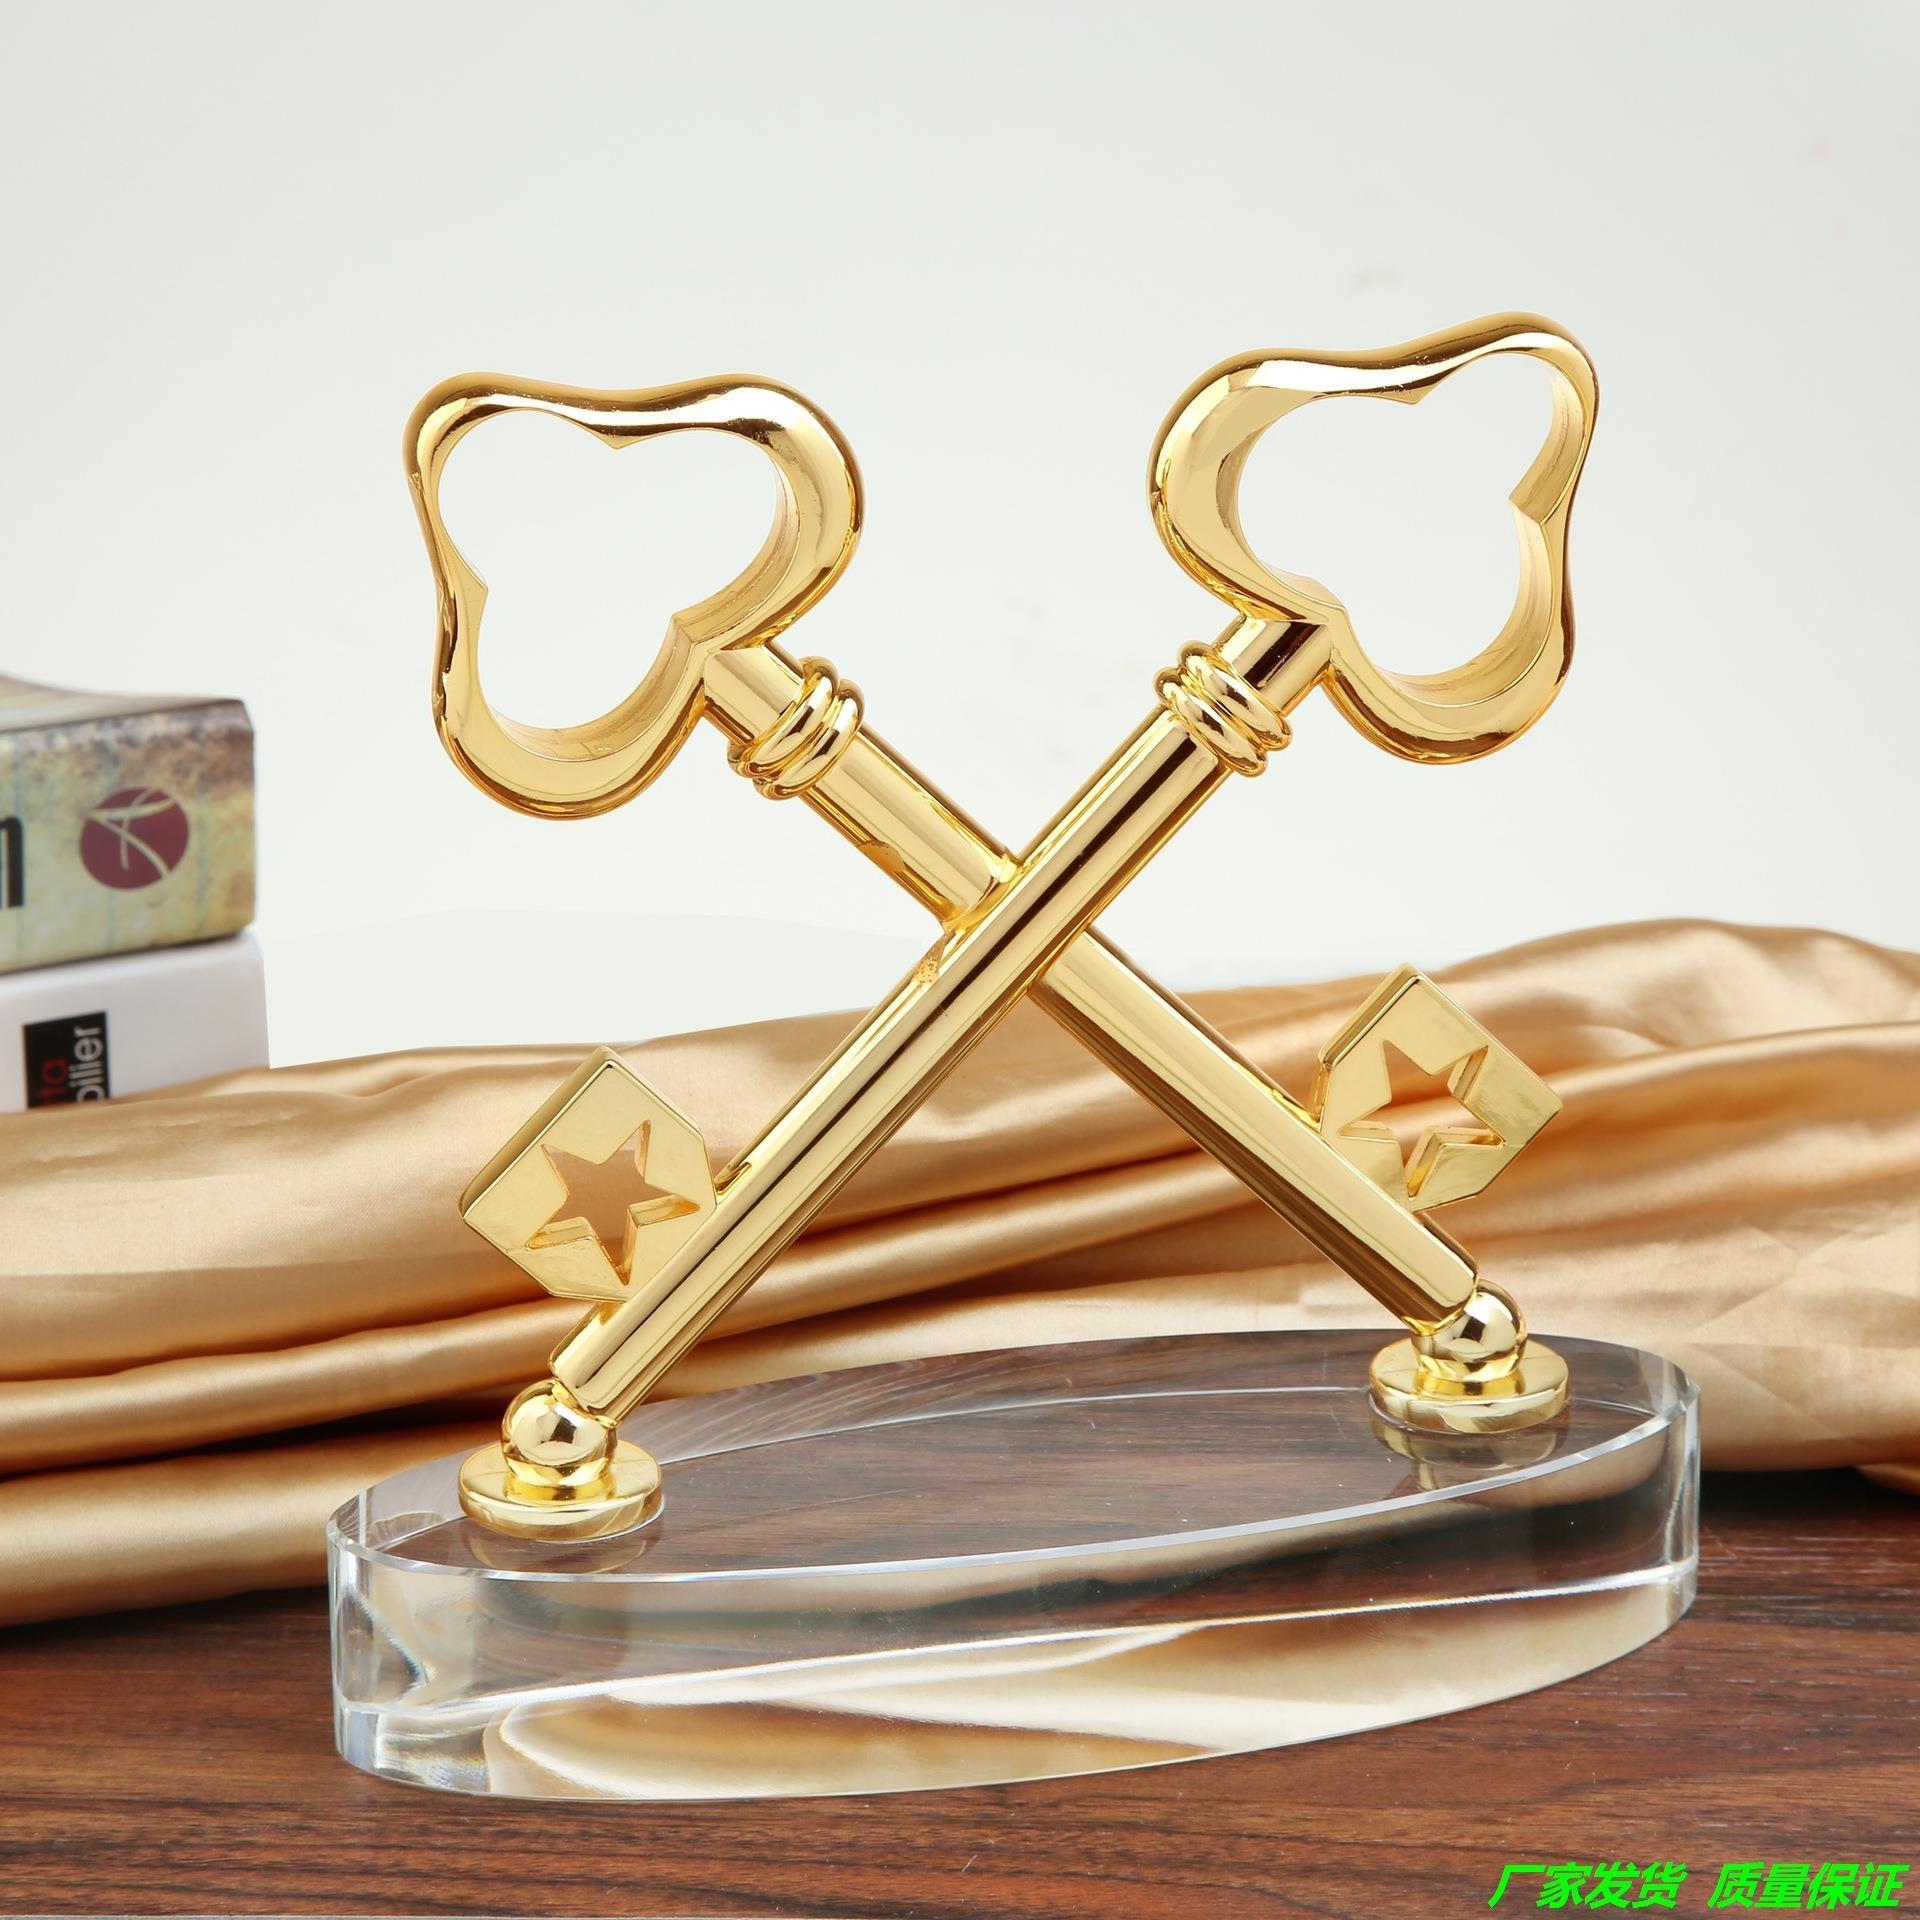 Сувениры из других стран Артикул 564797277717